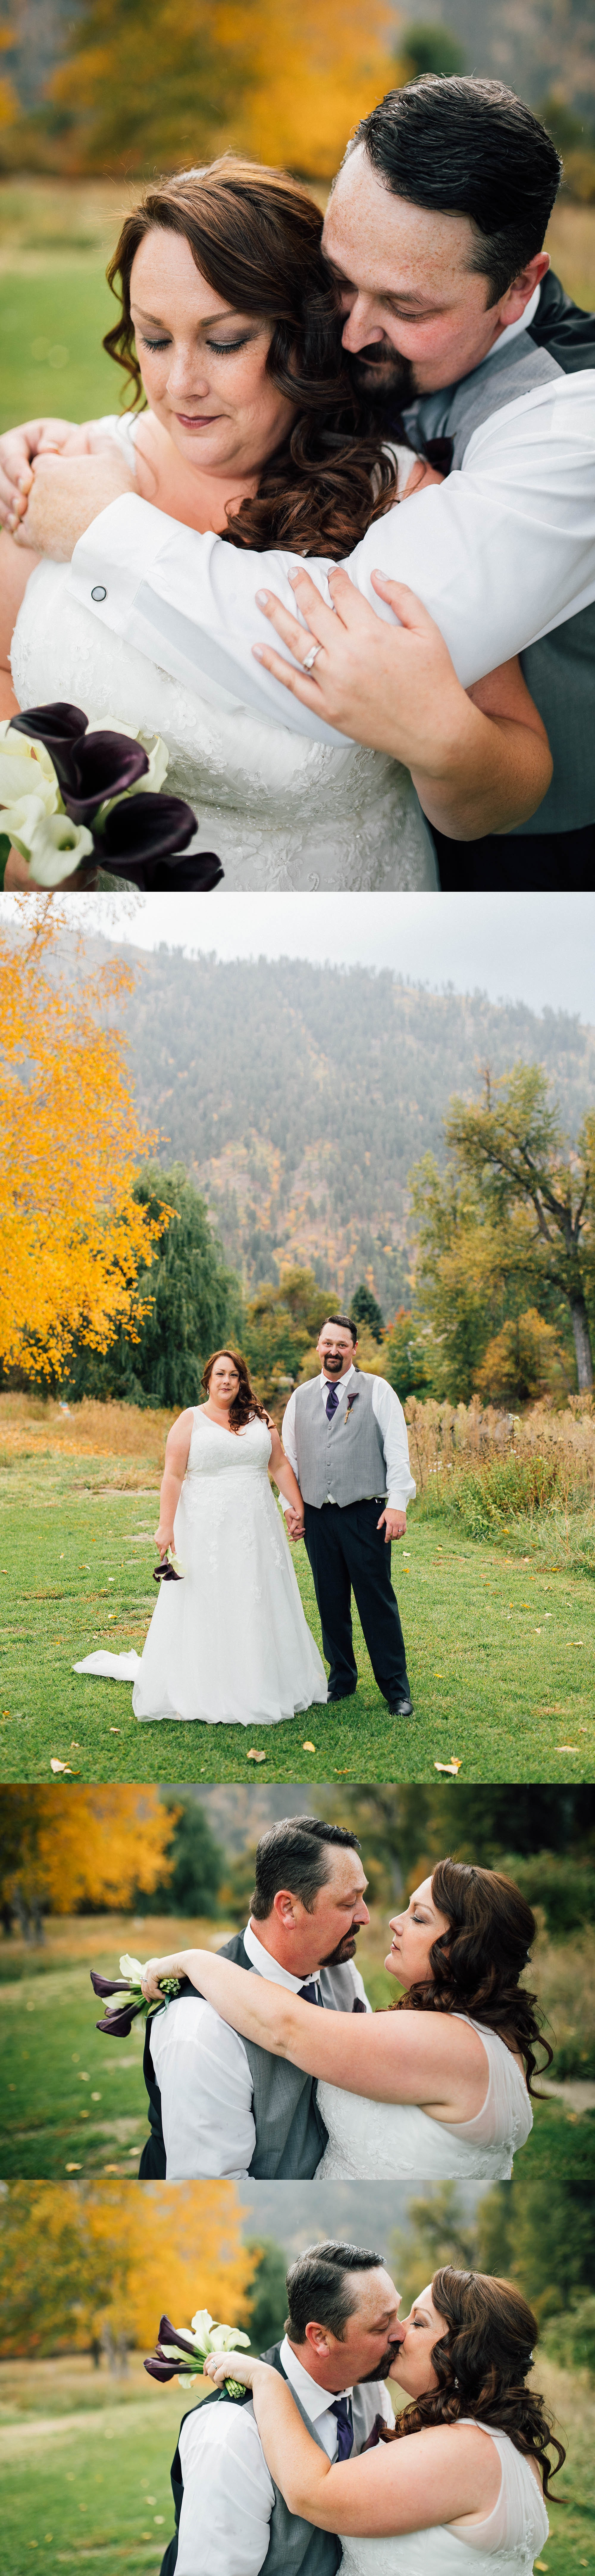 ashley_vos_seattle_ wedding_photographer_0241.jpg